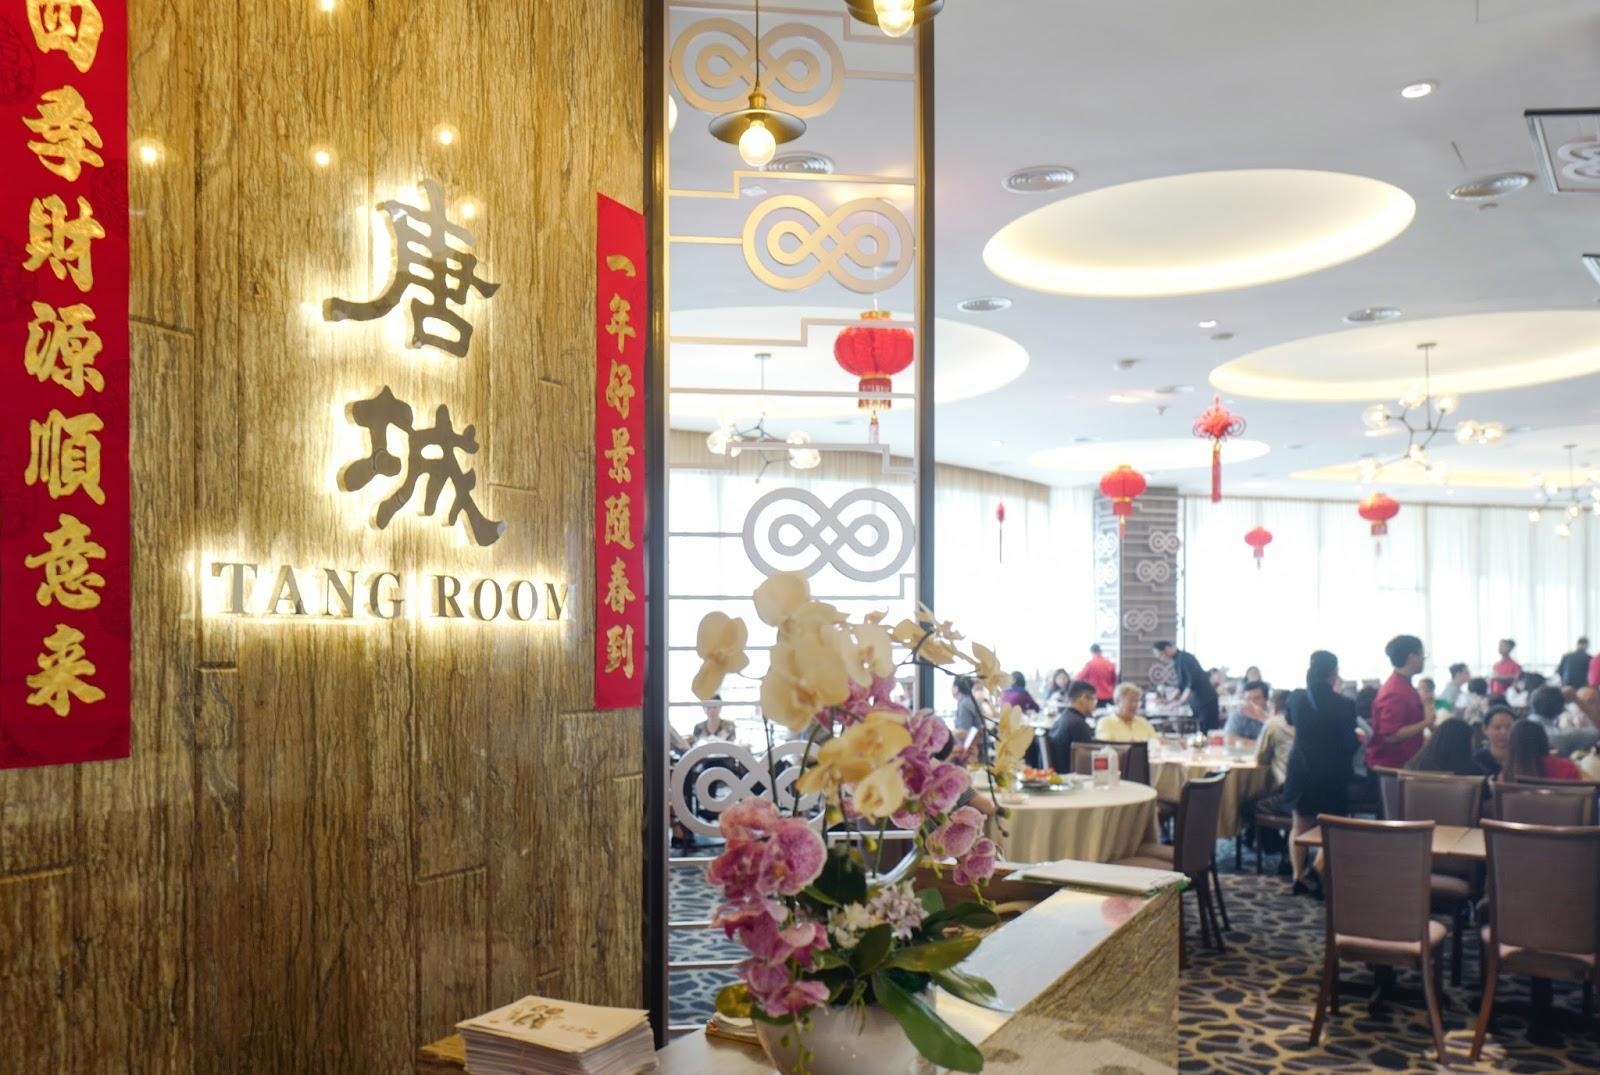 Tang Room Starling Menu